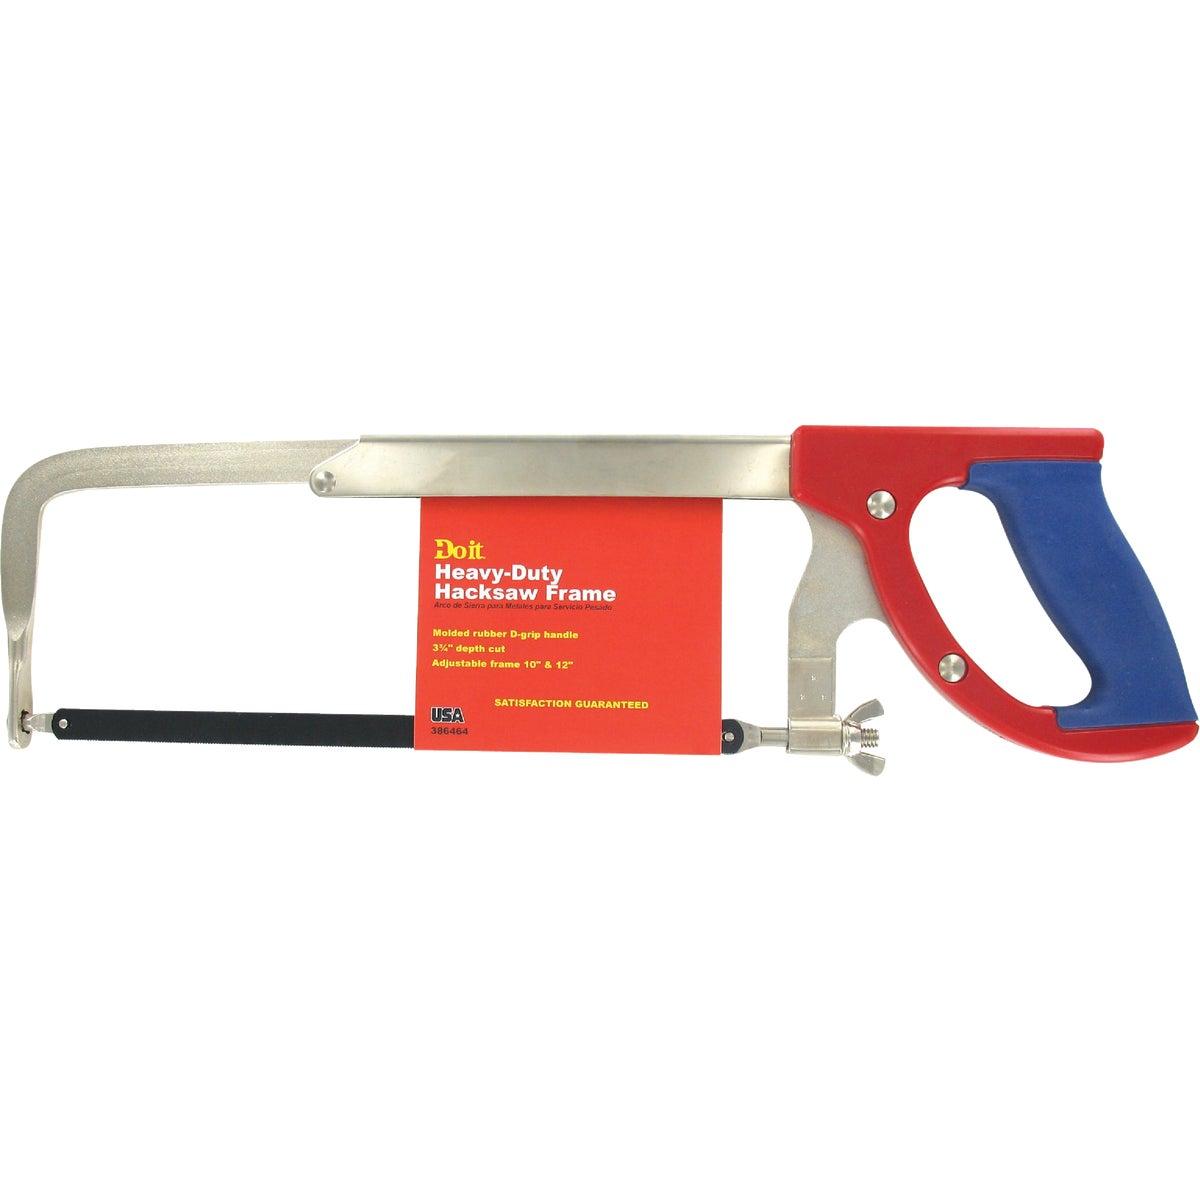 PRO HACKSAW FRAME - 262125R by Great Neck Saw Inc